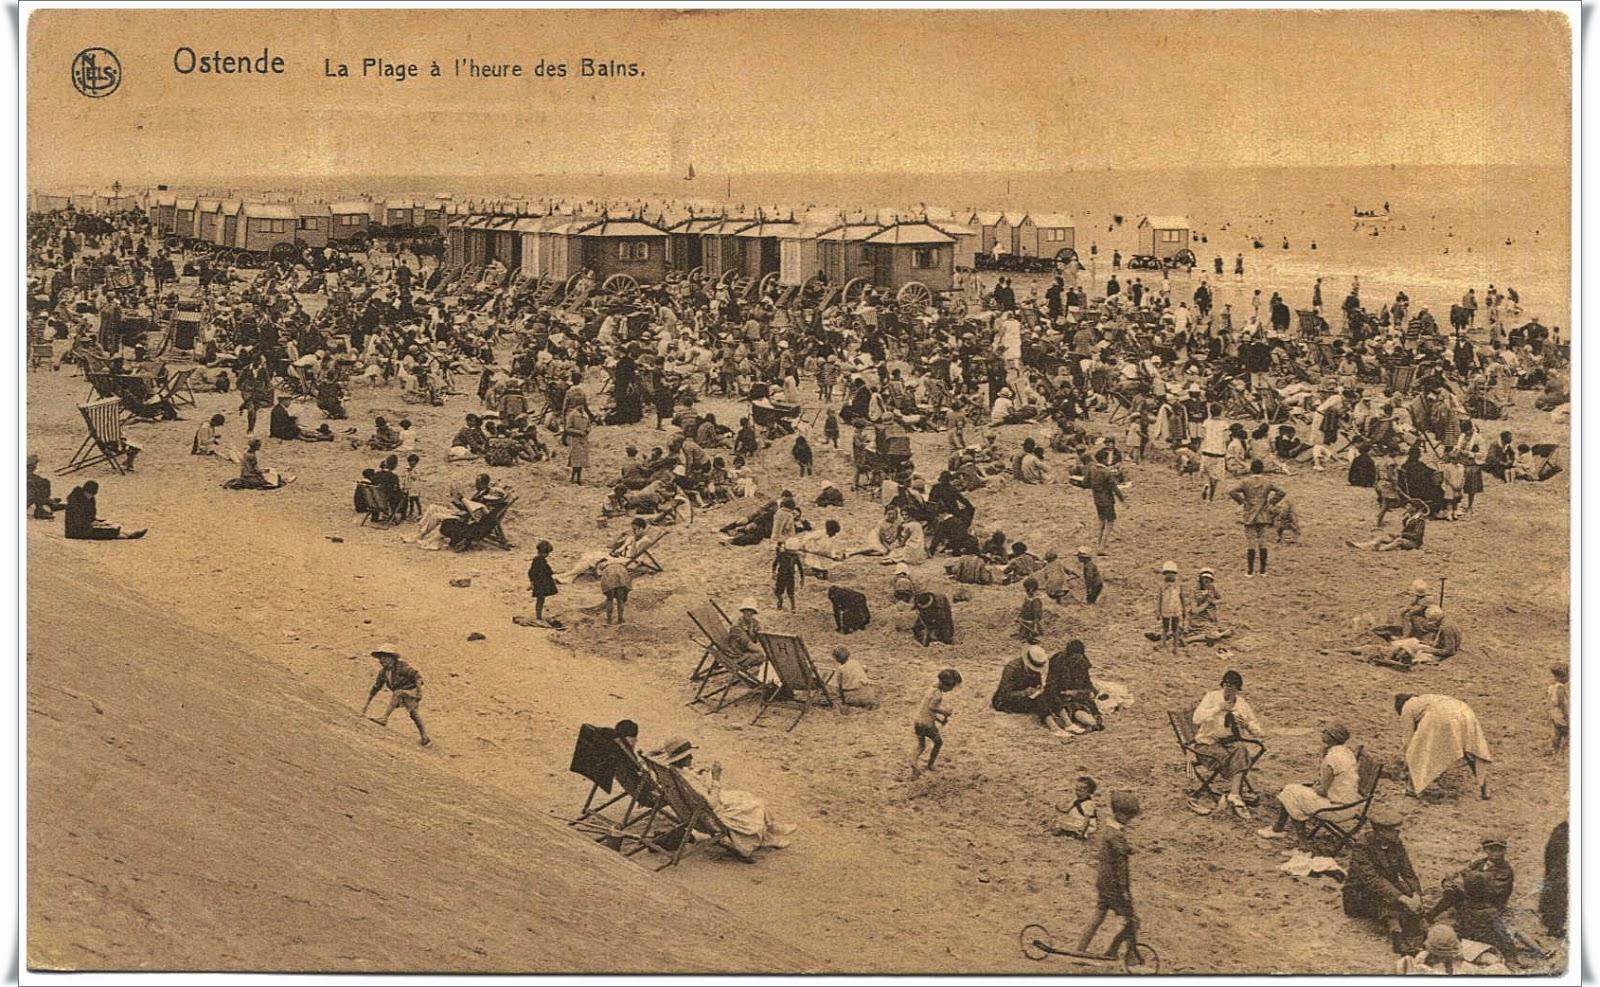 Ostende La Plage a l'heure des Bains in 1920s